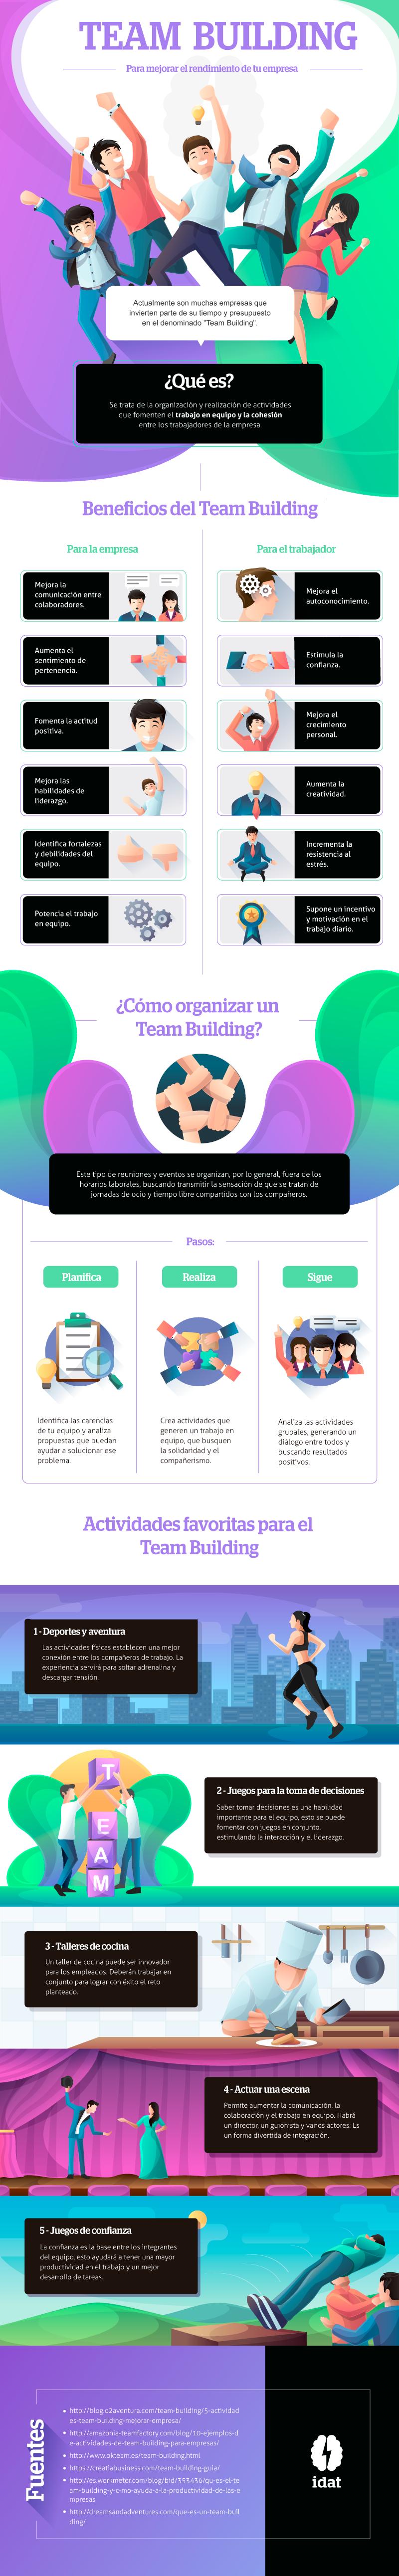 Team Building: para mejorar el rendimiento de tu empresa #infografia #infographic #rrhh